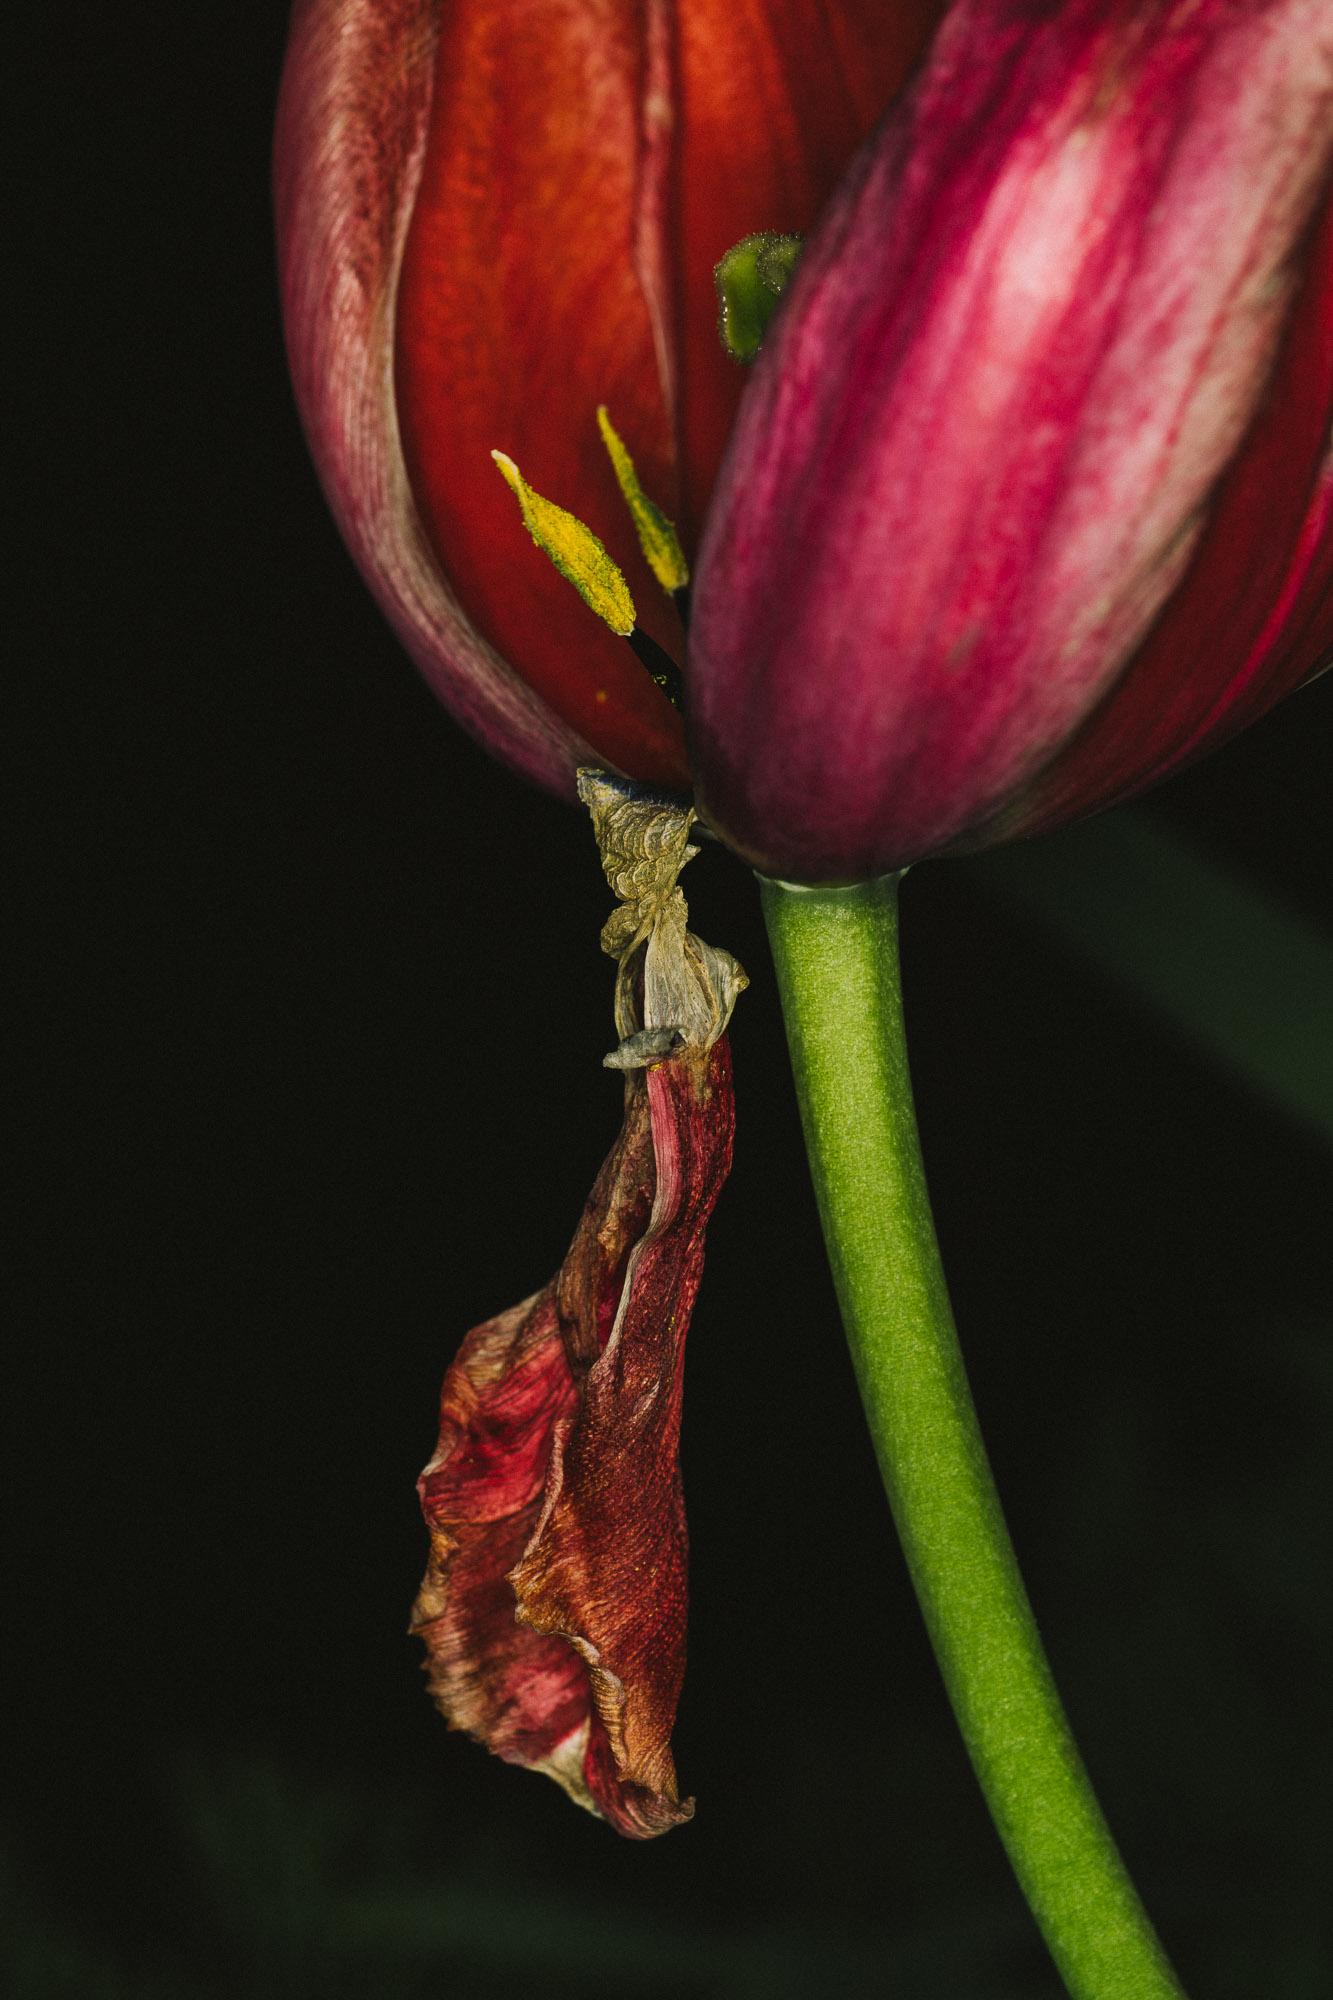 20180420_tulips_0171.jpg